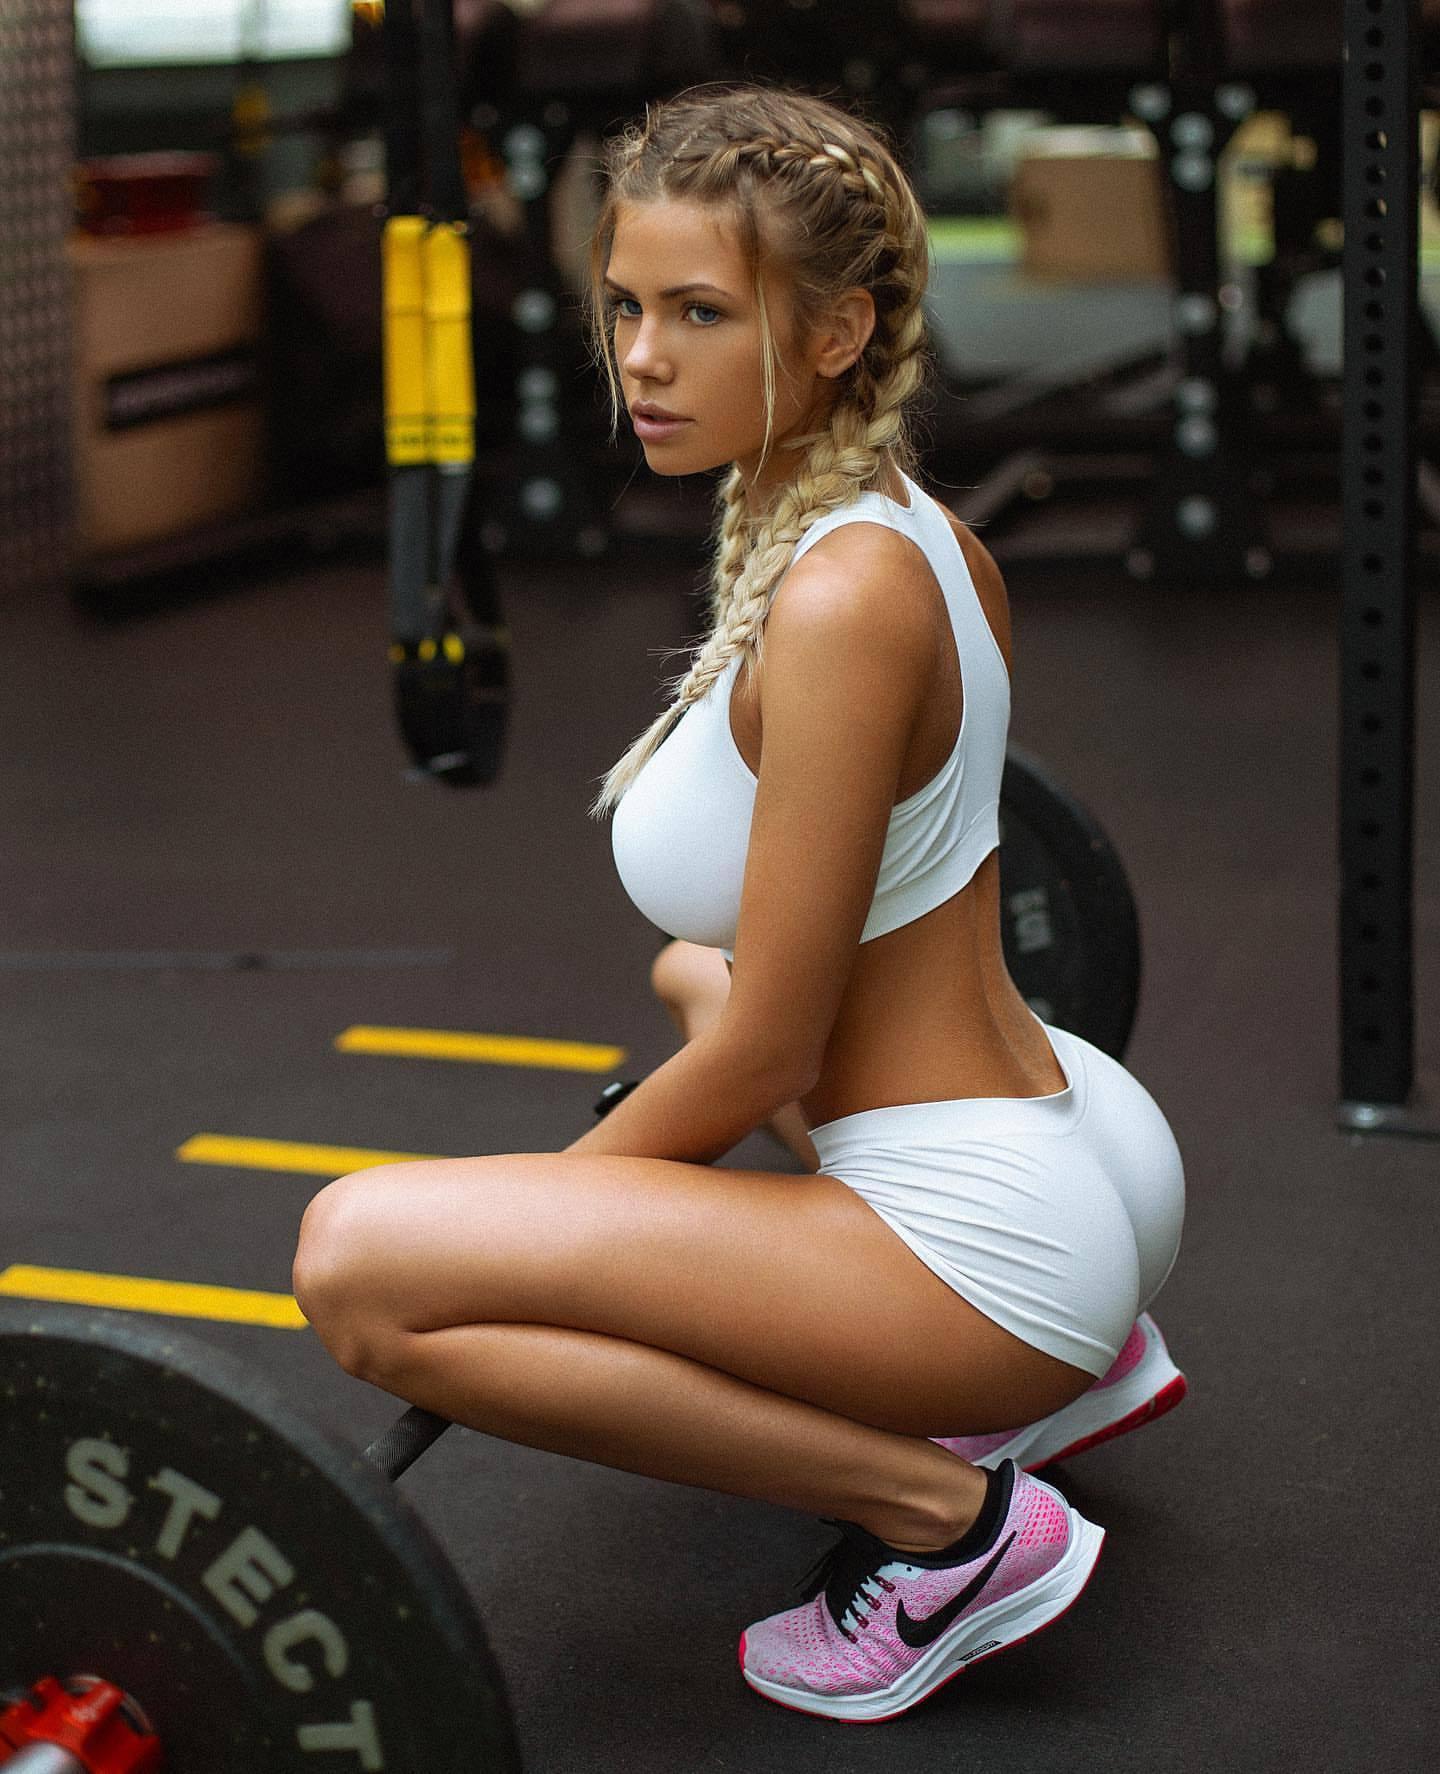 Nata Lee Spectacular Body